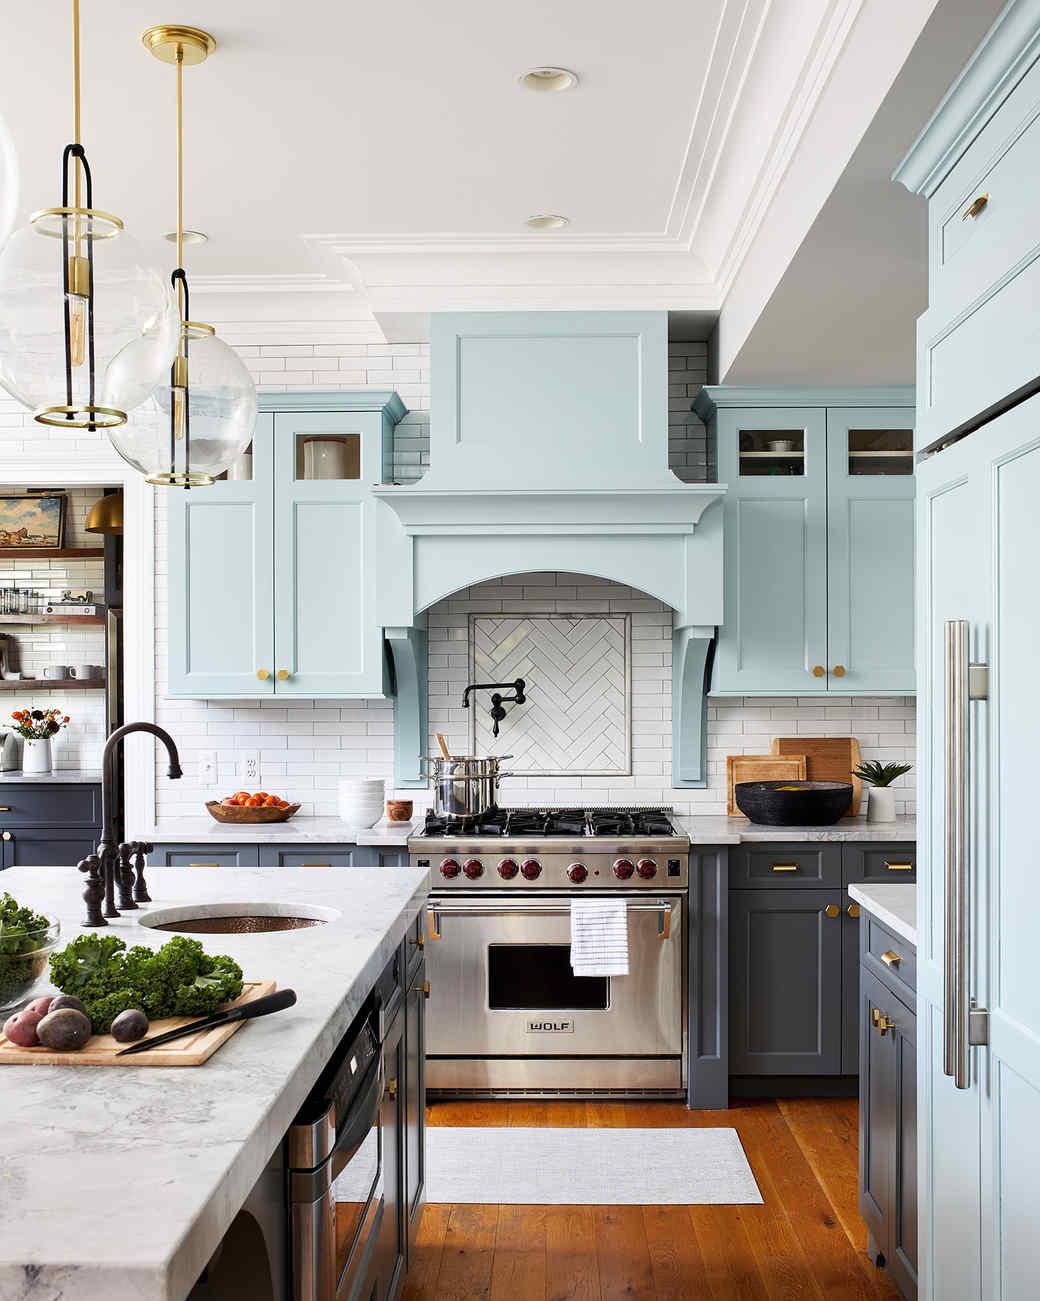 11 common kitchen renovation mistakes to avoid martha stewart